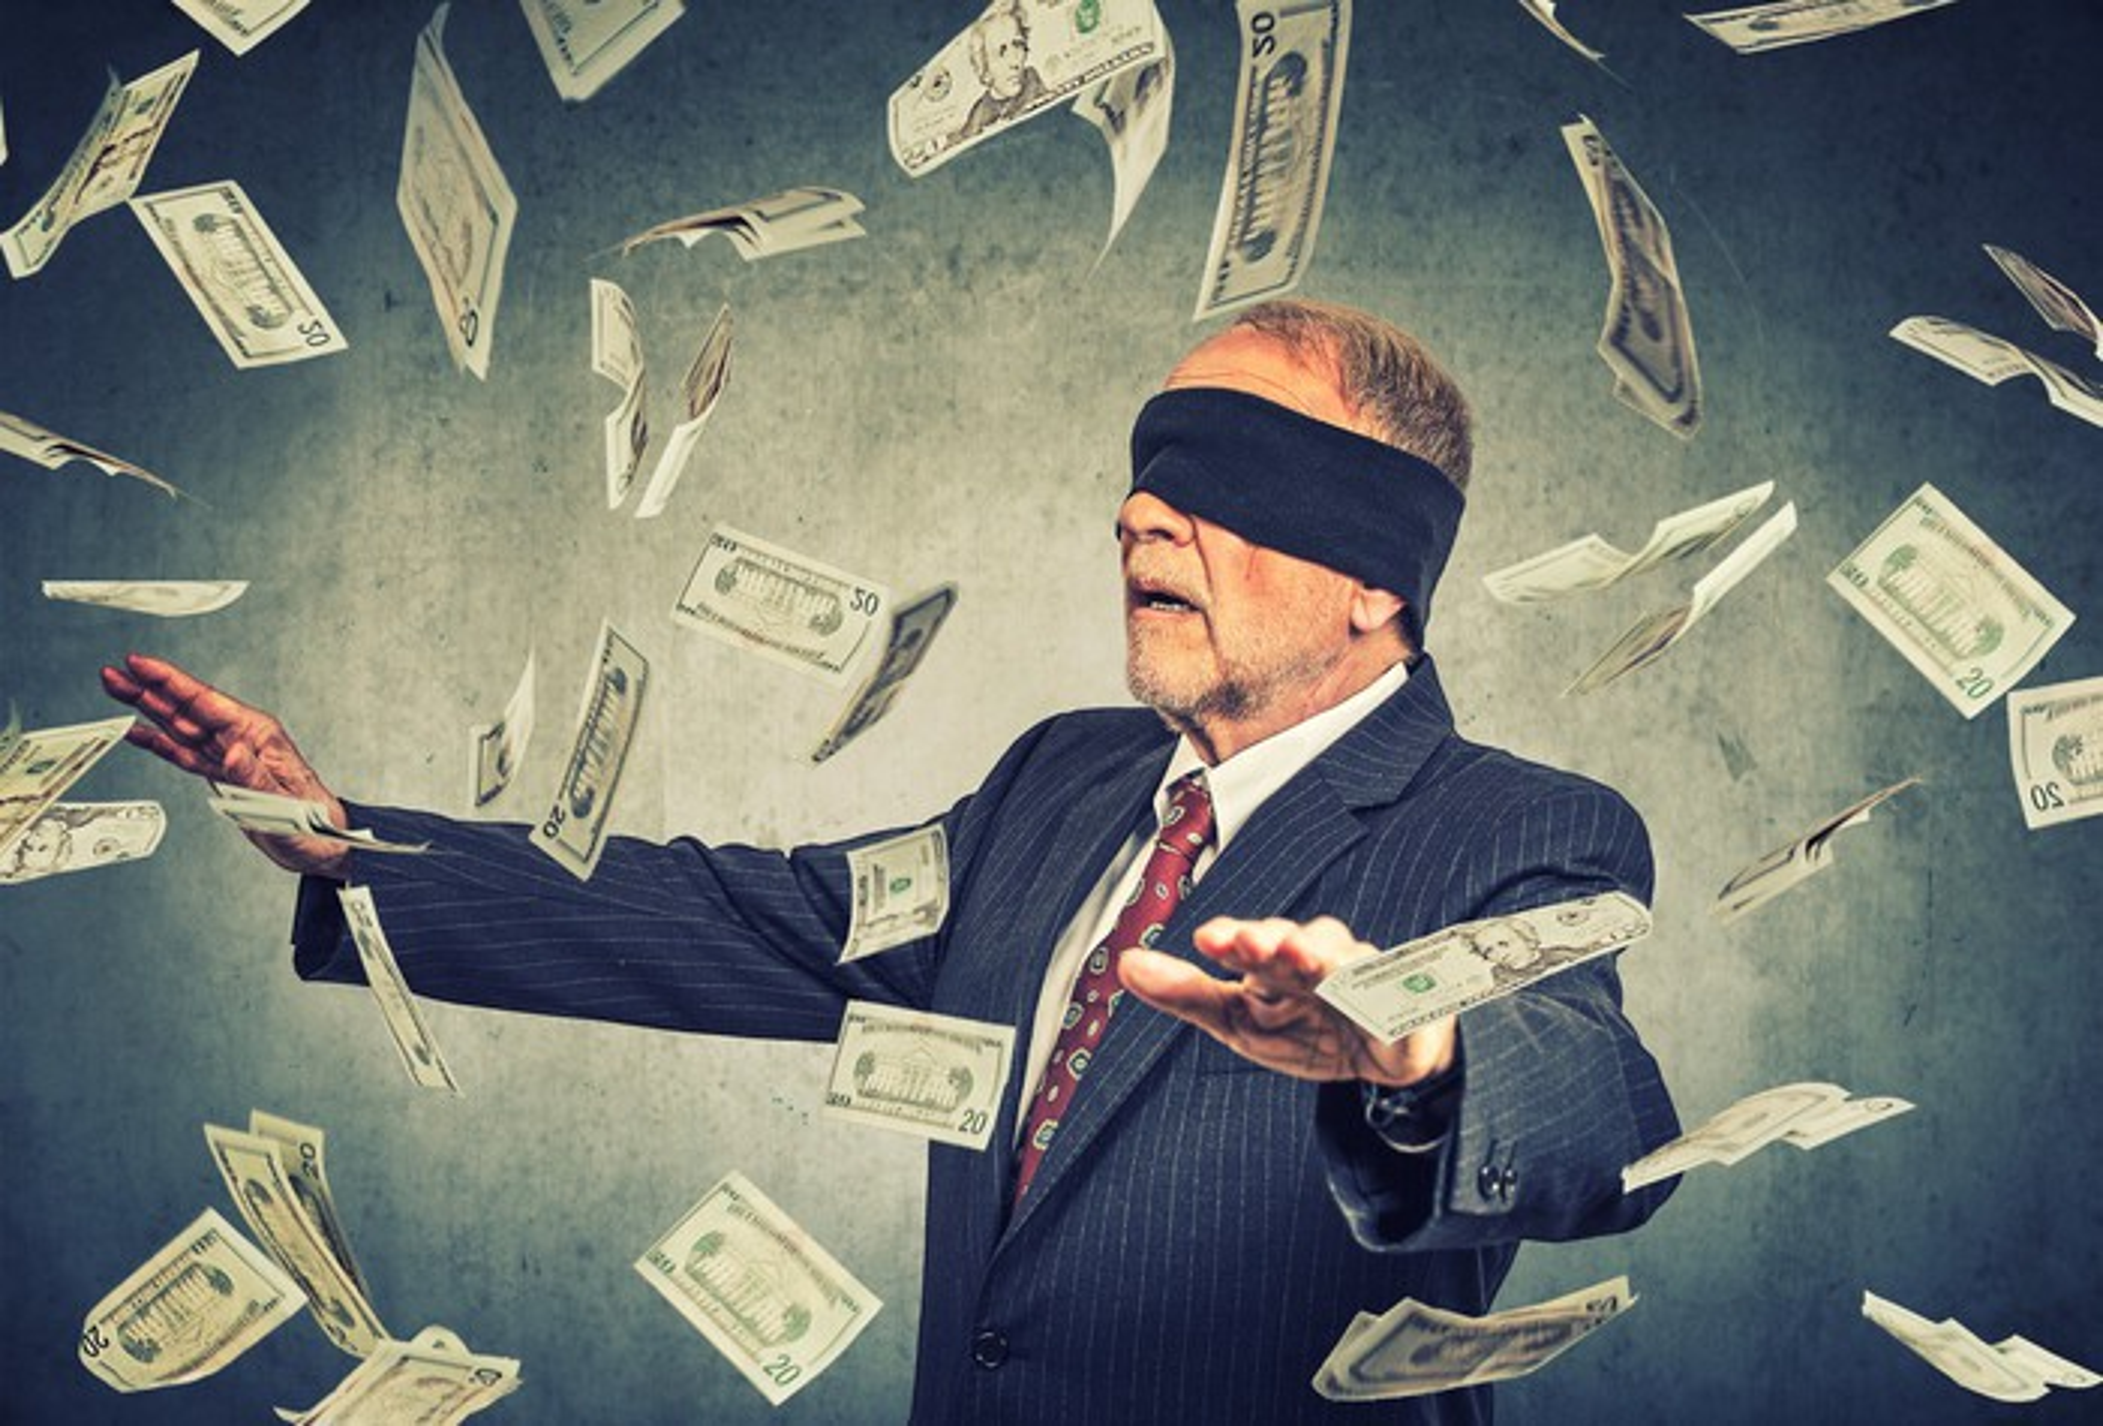 A blindfolded businessman chasing twenty-dollar bills floating in the air around him.